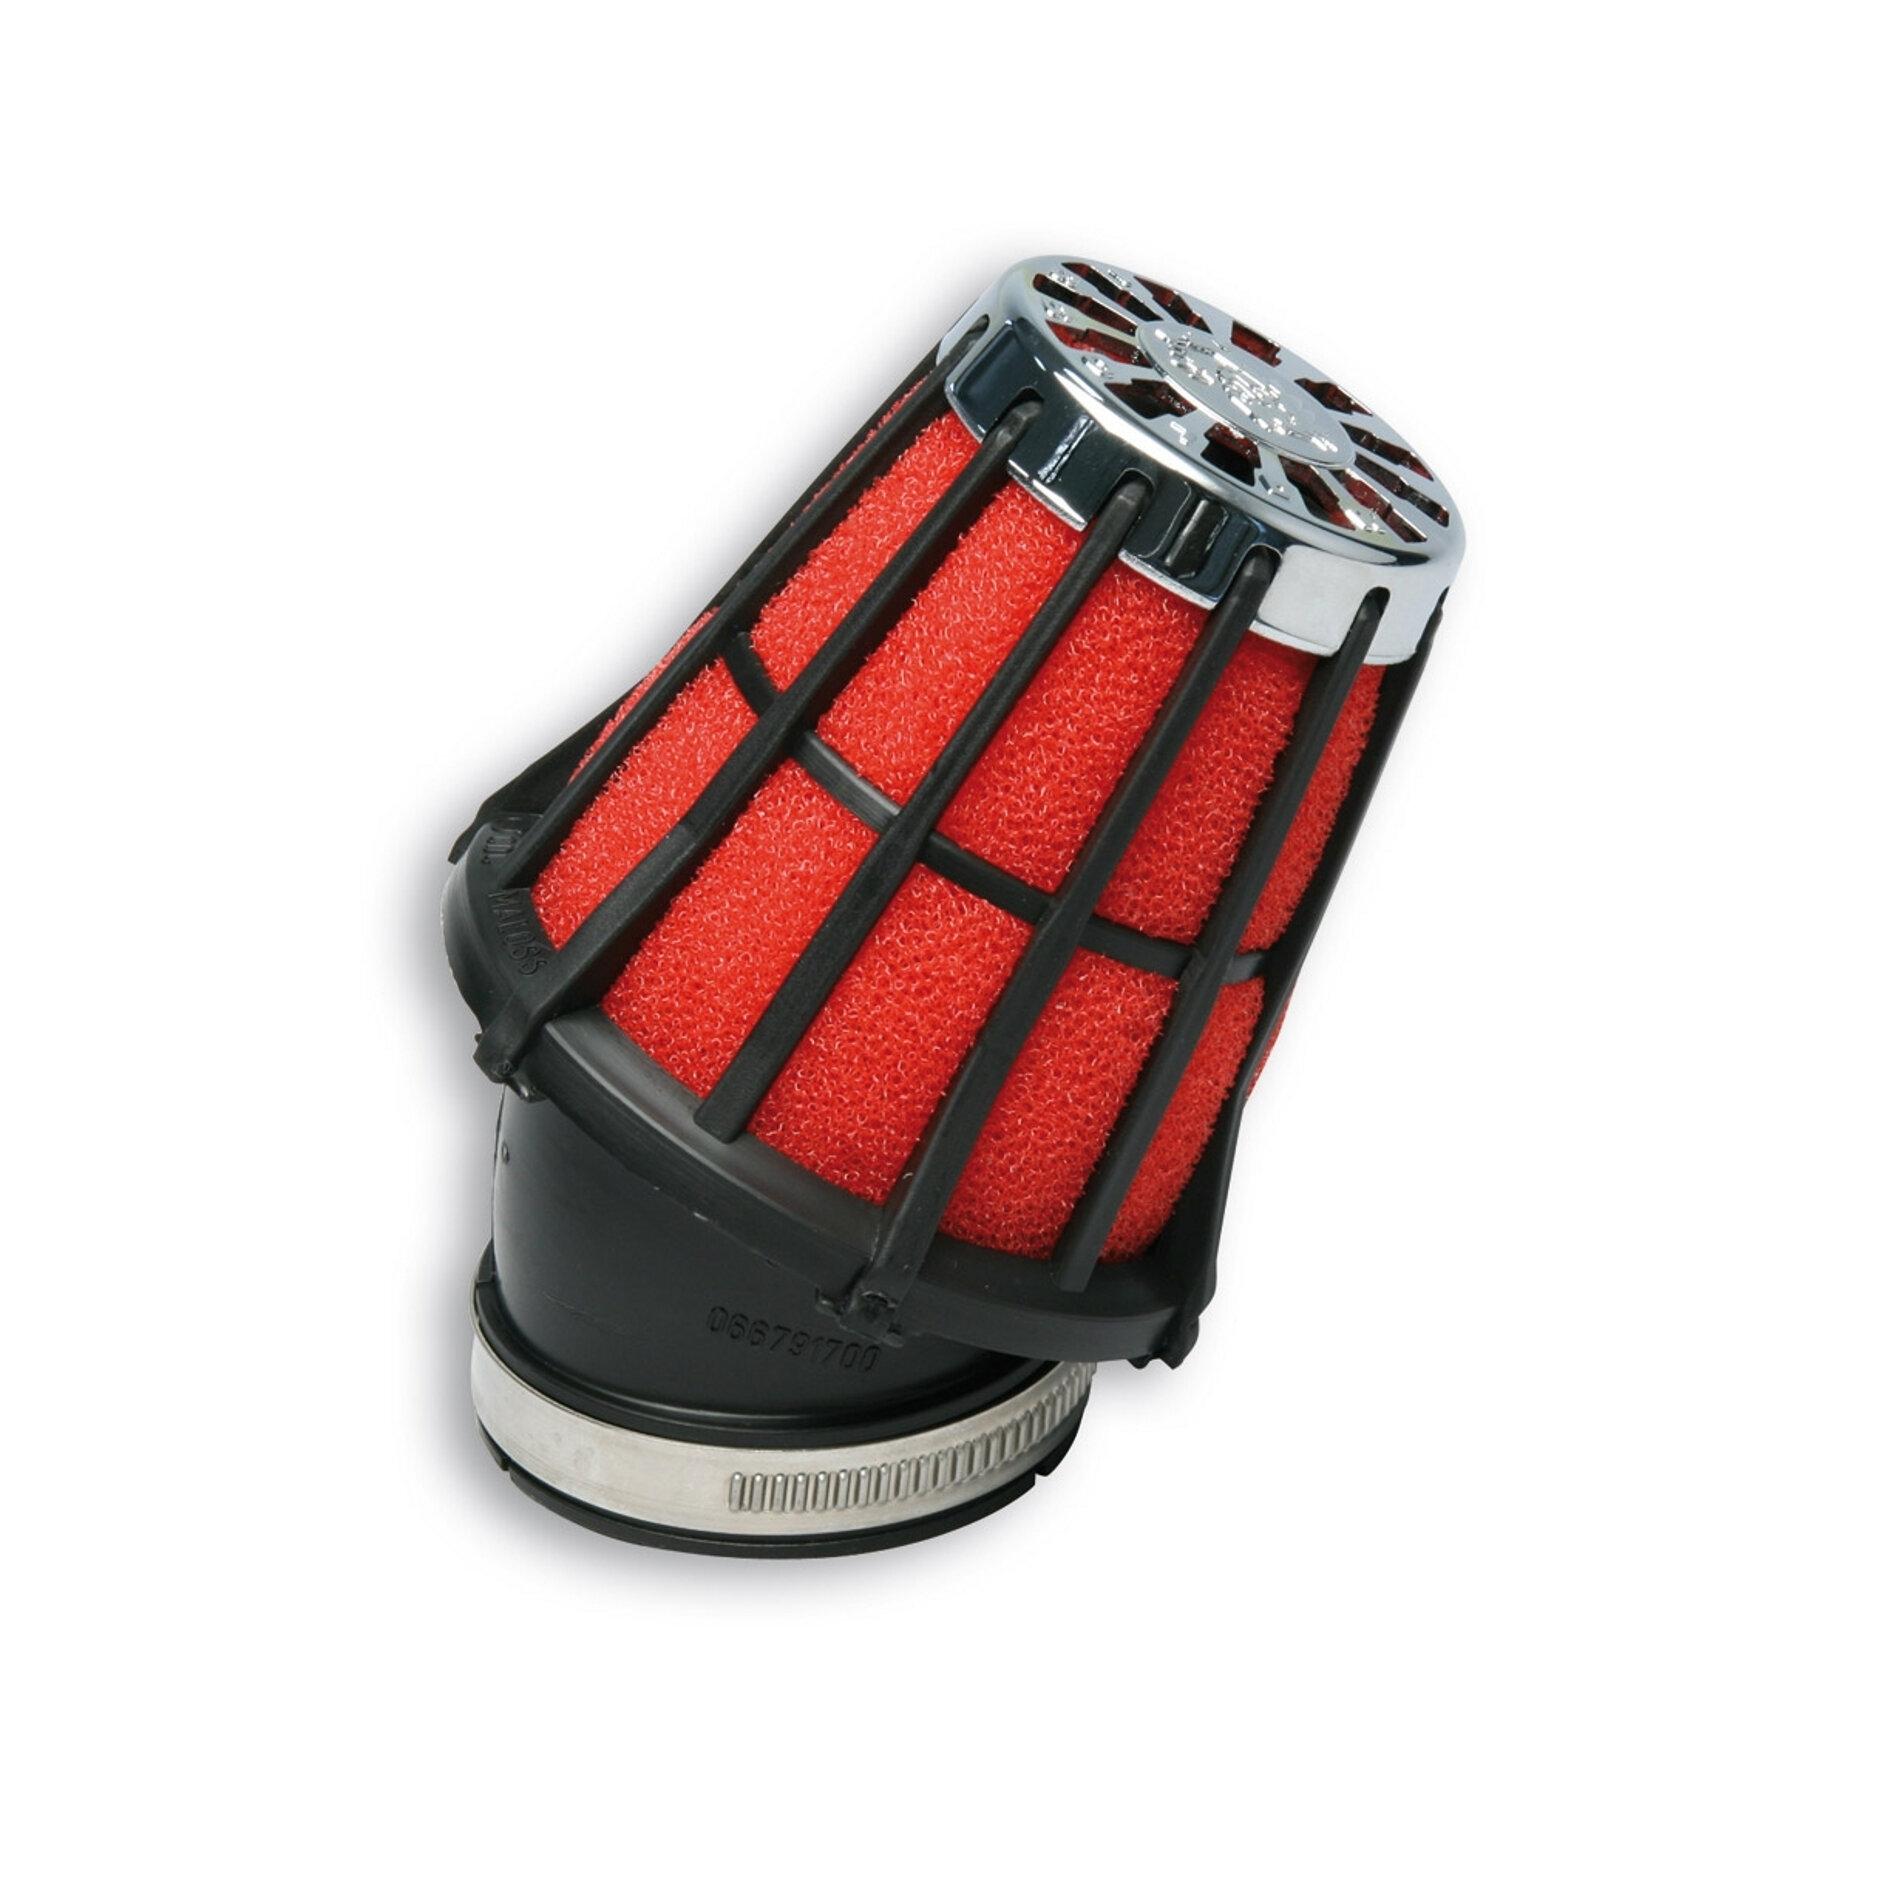 Filtre à air Malossi Red Filter E5 D.52 incliné 30